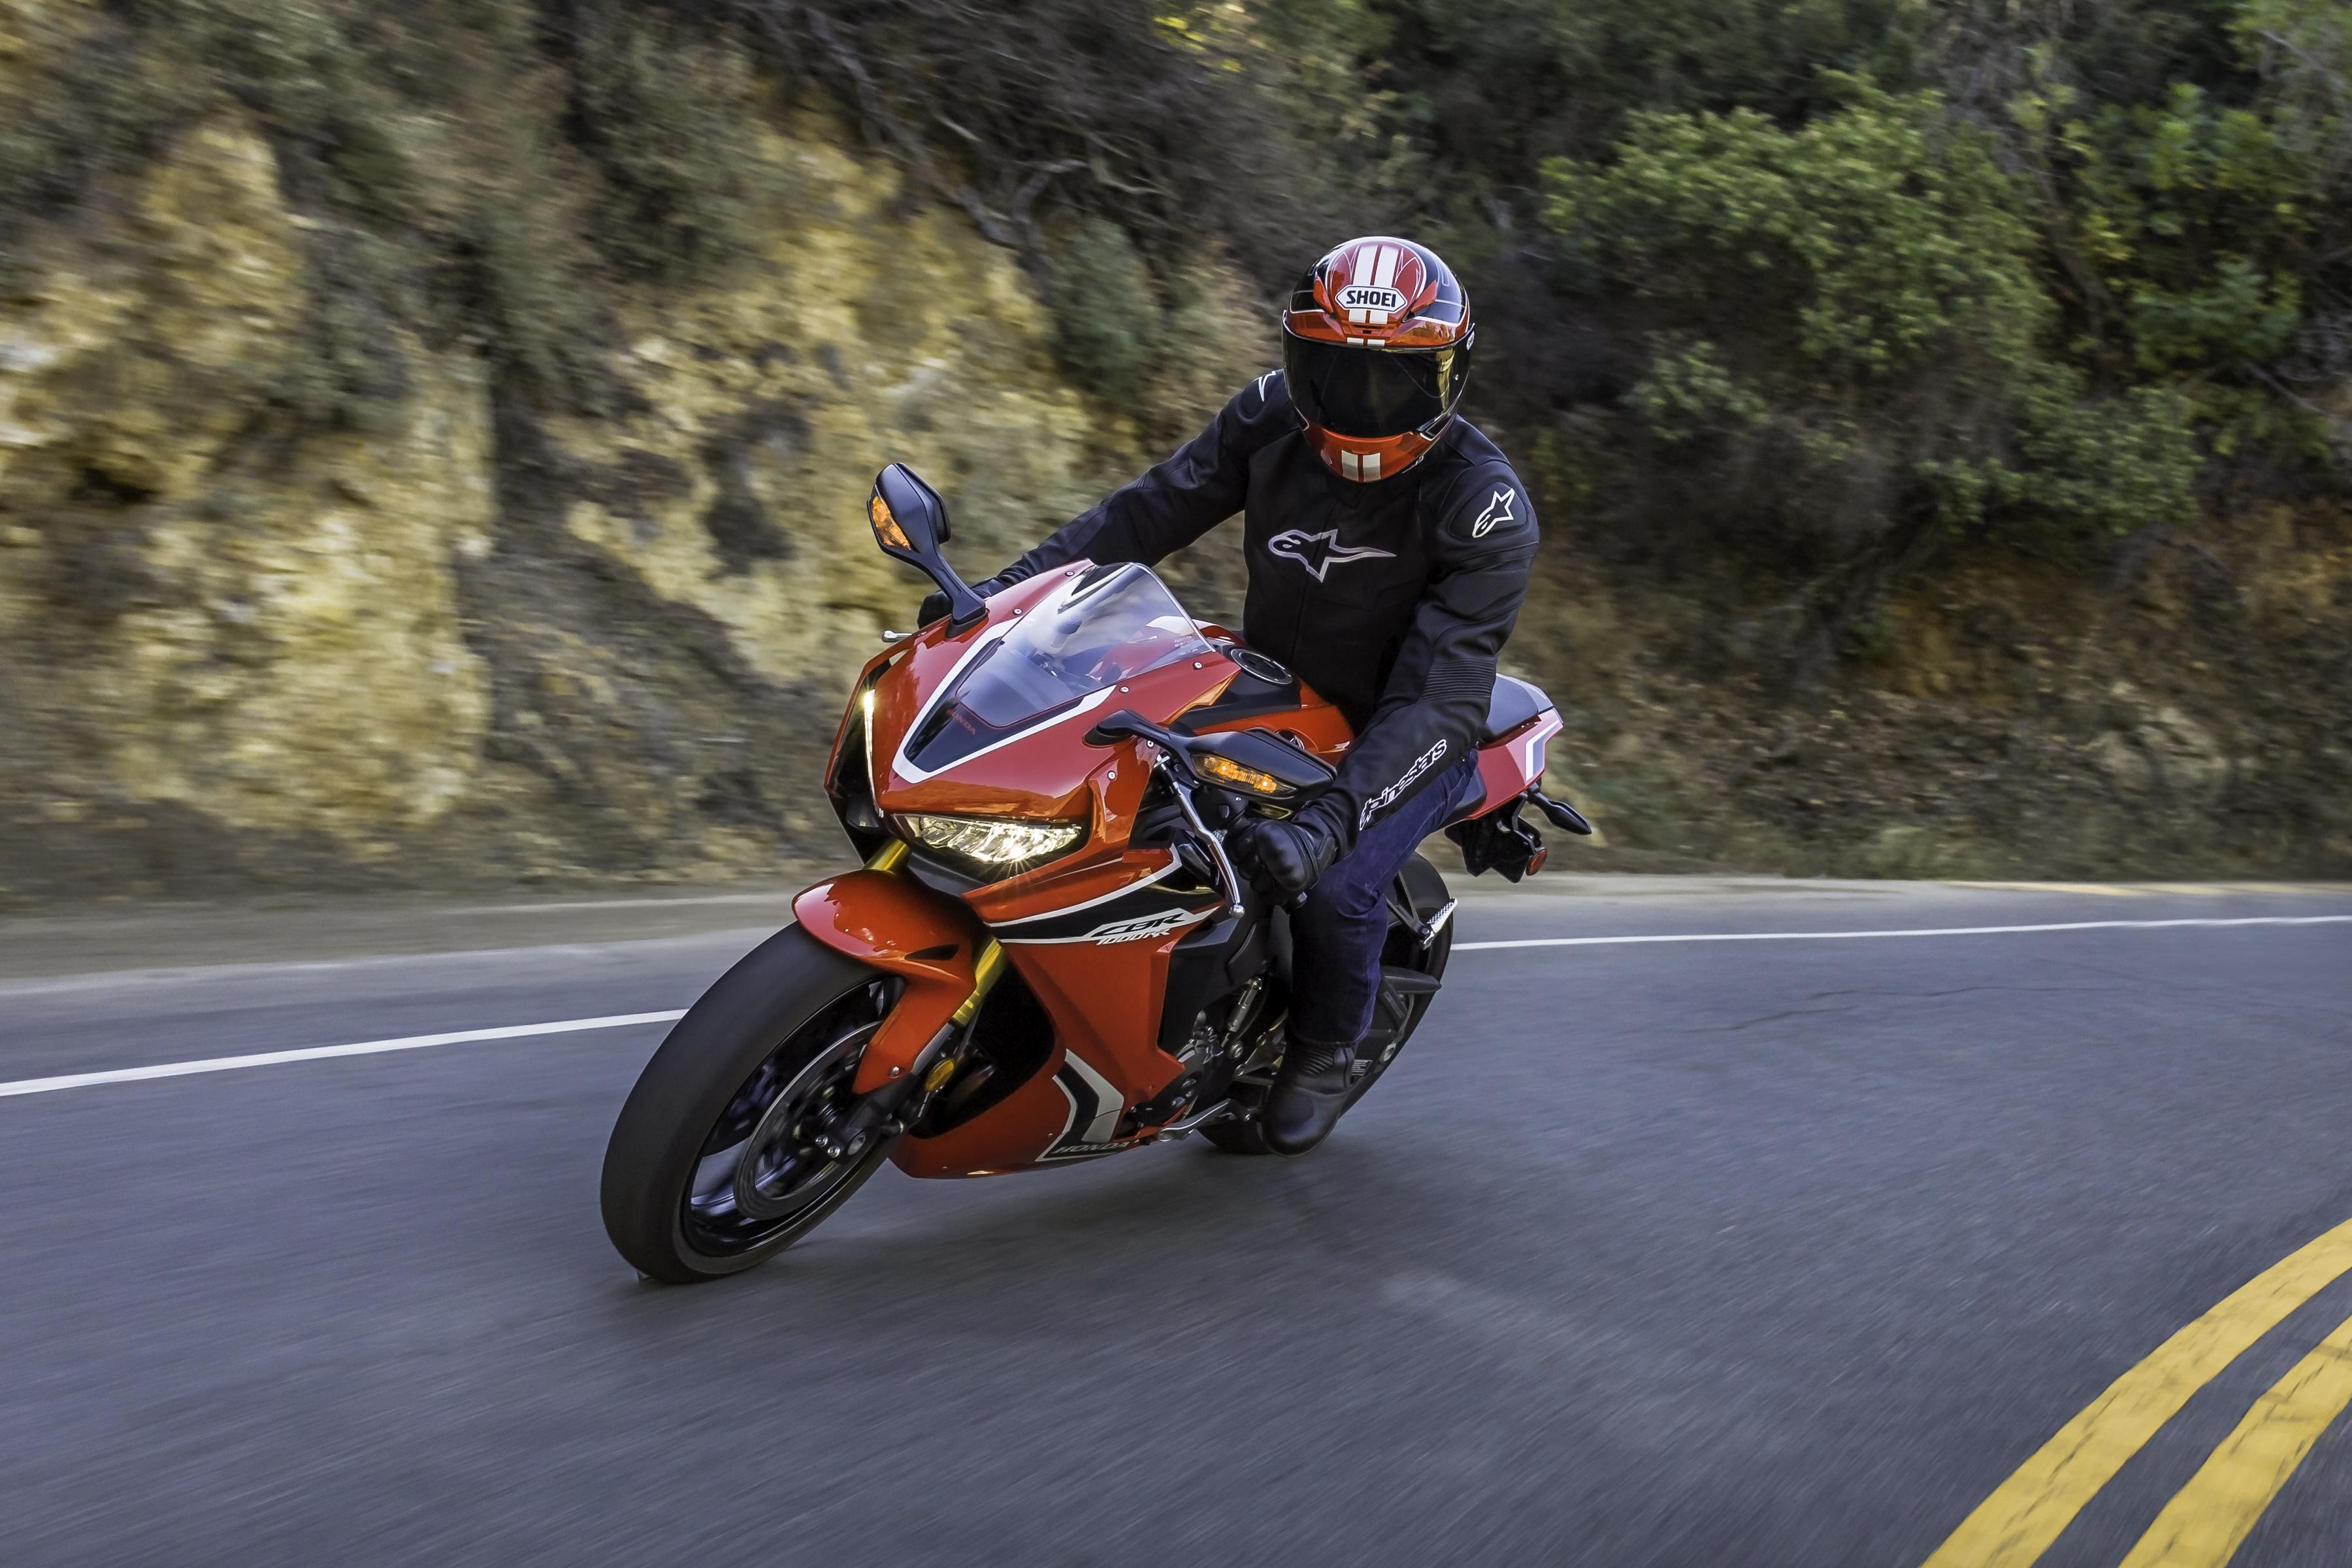 Honda motorcycles for sale olympia wa honda dealer for Honda dealers in washington state